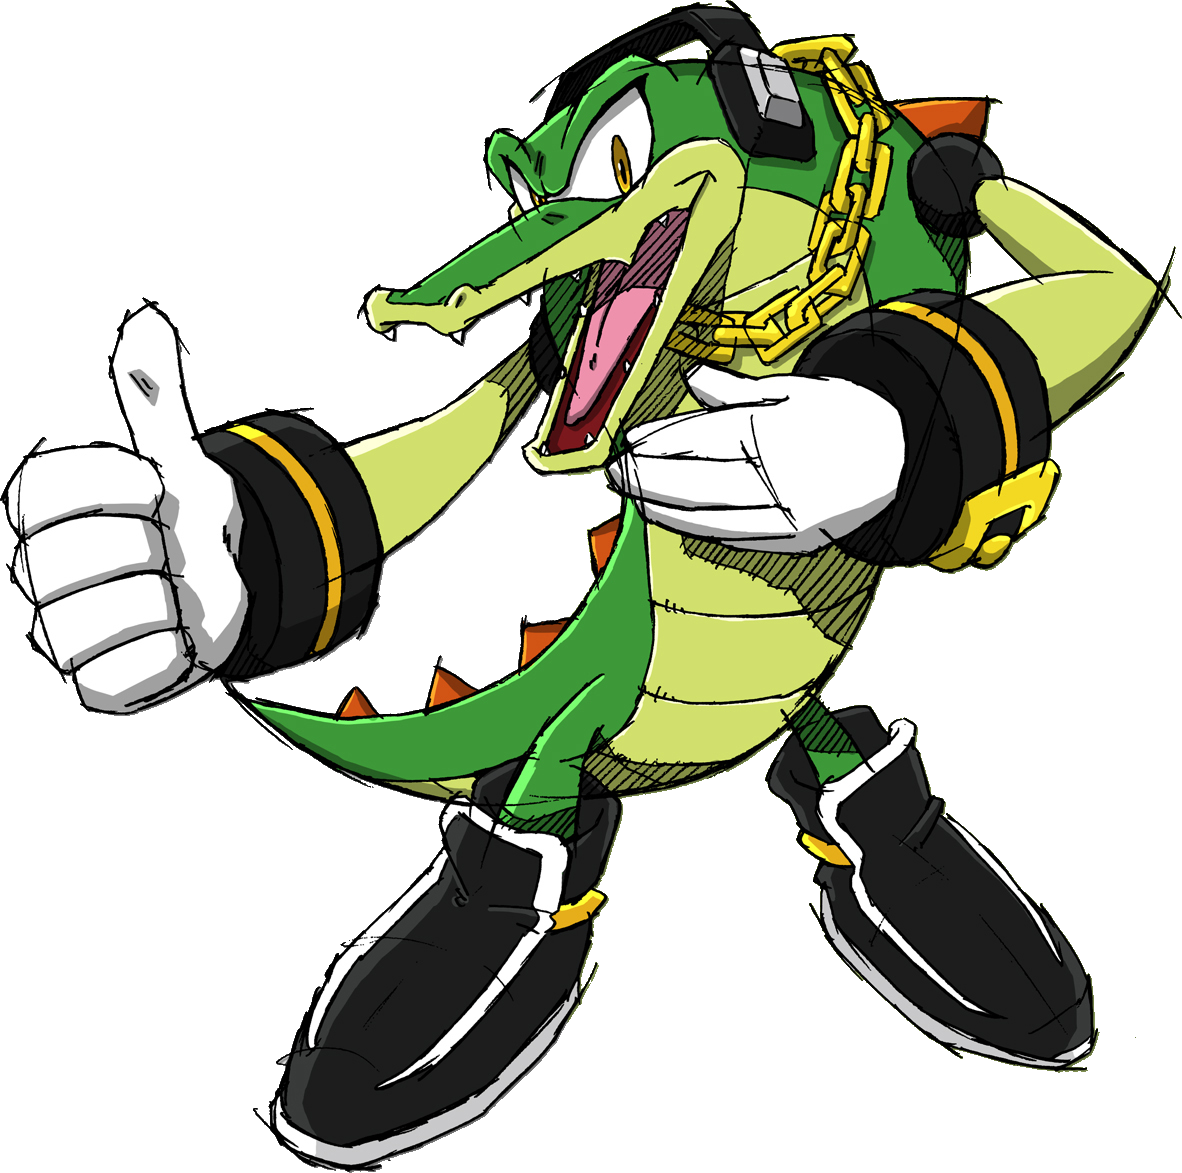 1182x1173 Vector The Crocodile Fan Club Images Vector The Crocodile Sketch